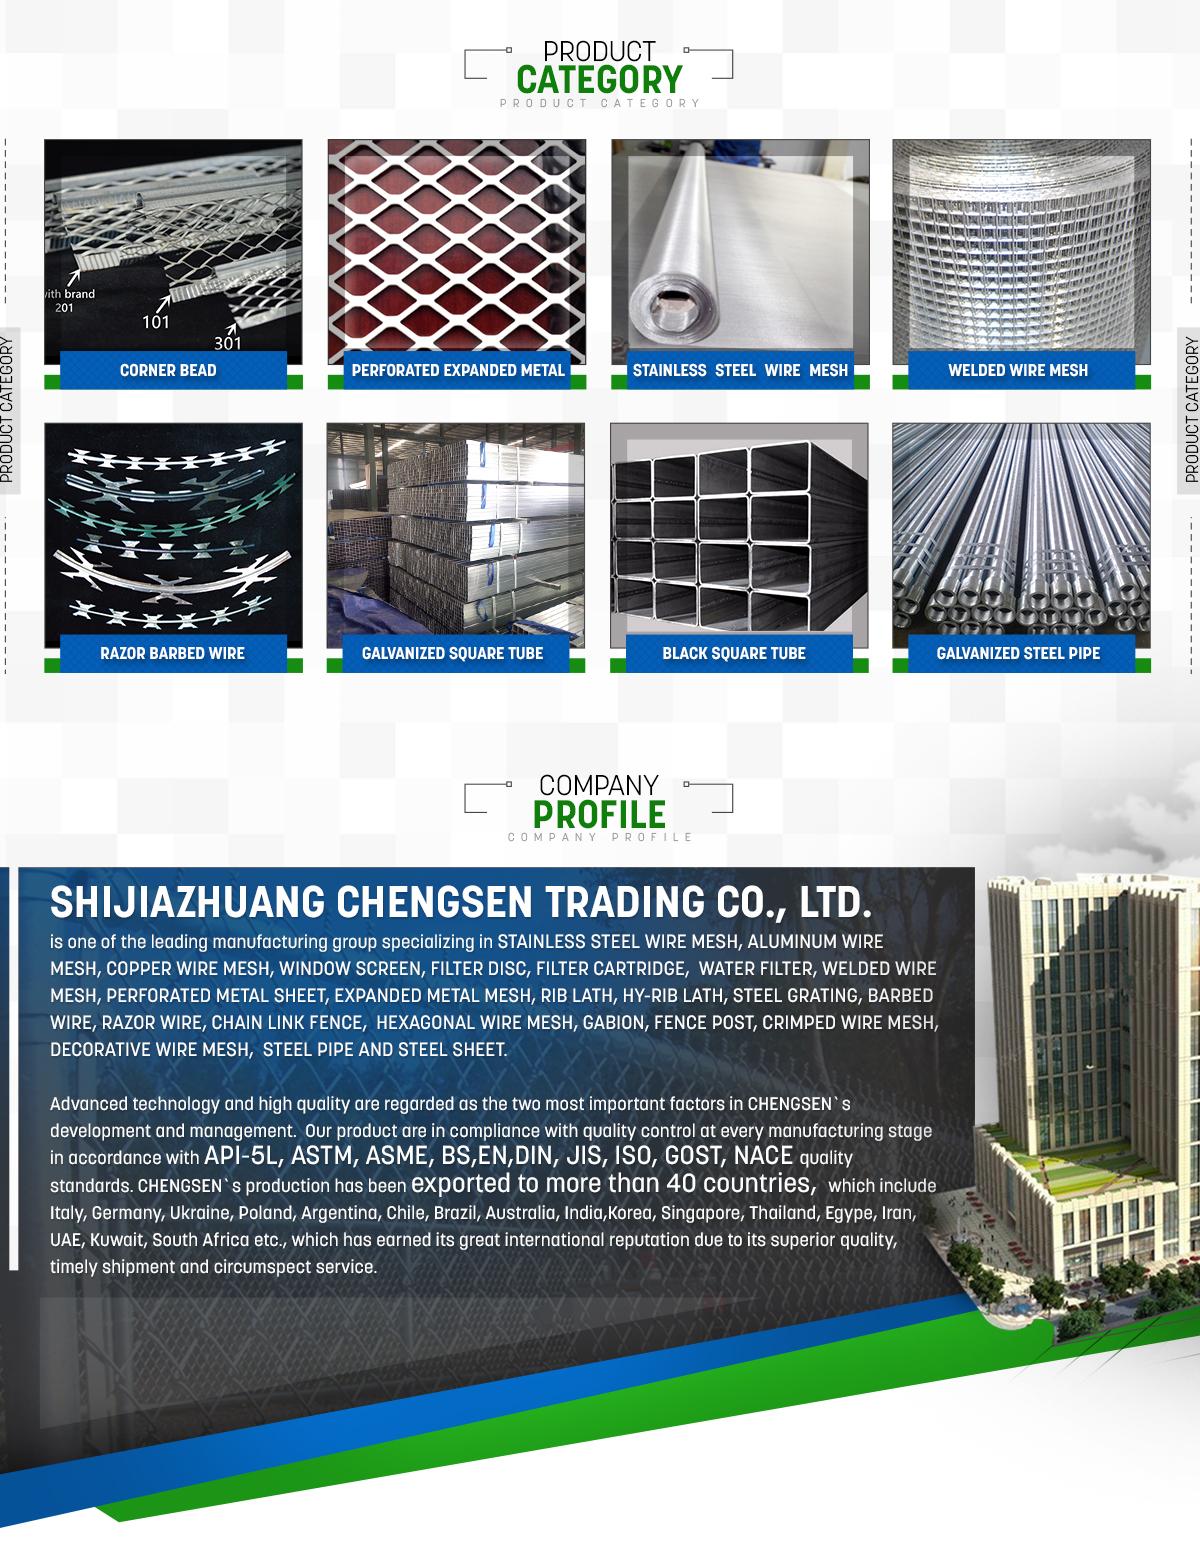 Shijiazhuang Chengsen Trading Co., Ltd. - Welded wire mesh ...